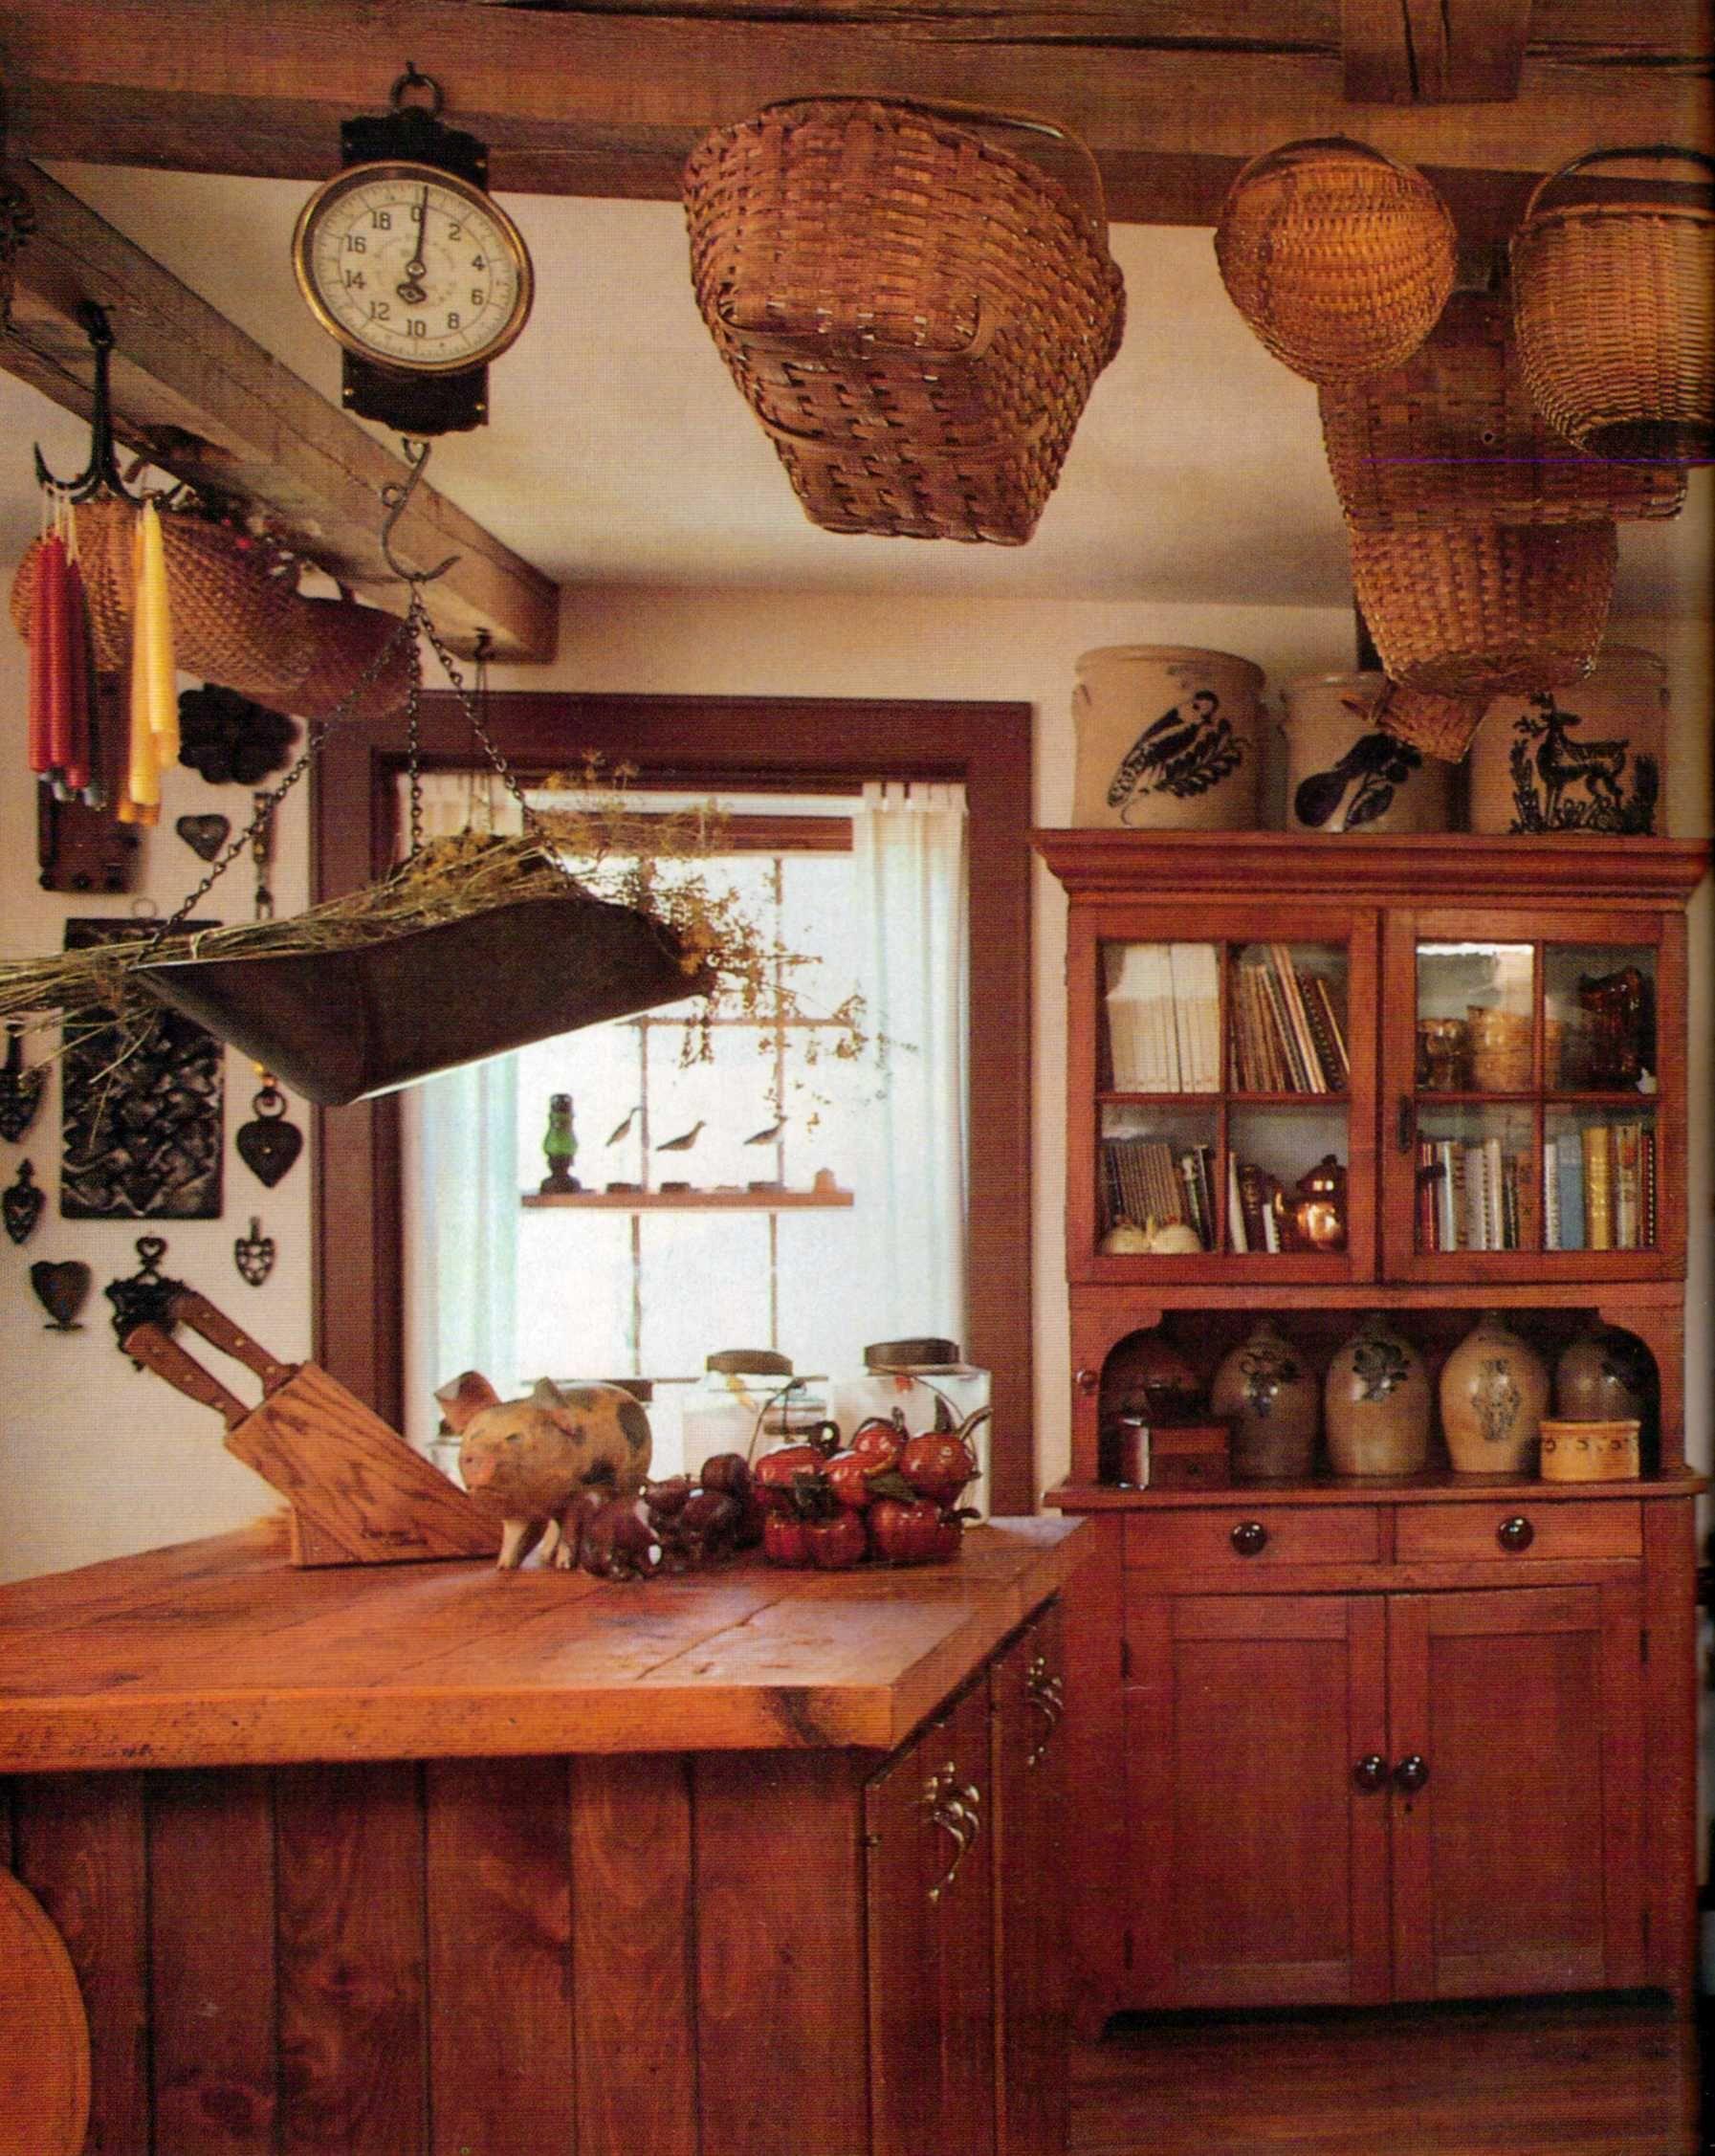 A Cozy Farm Kitchen Rustic Kitchen Primitive Kitchen